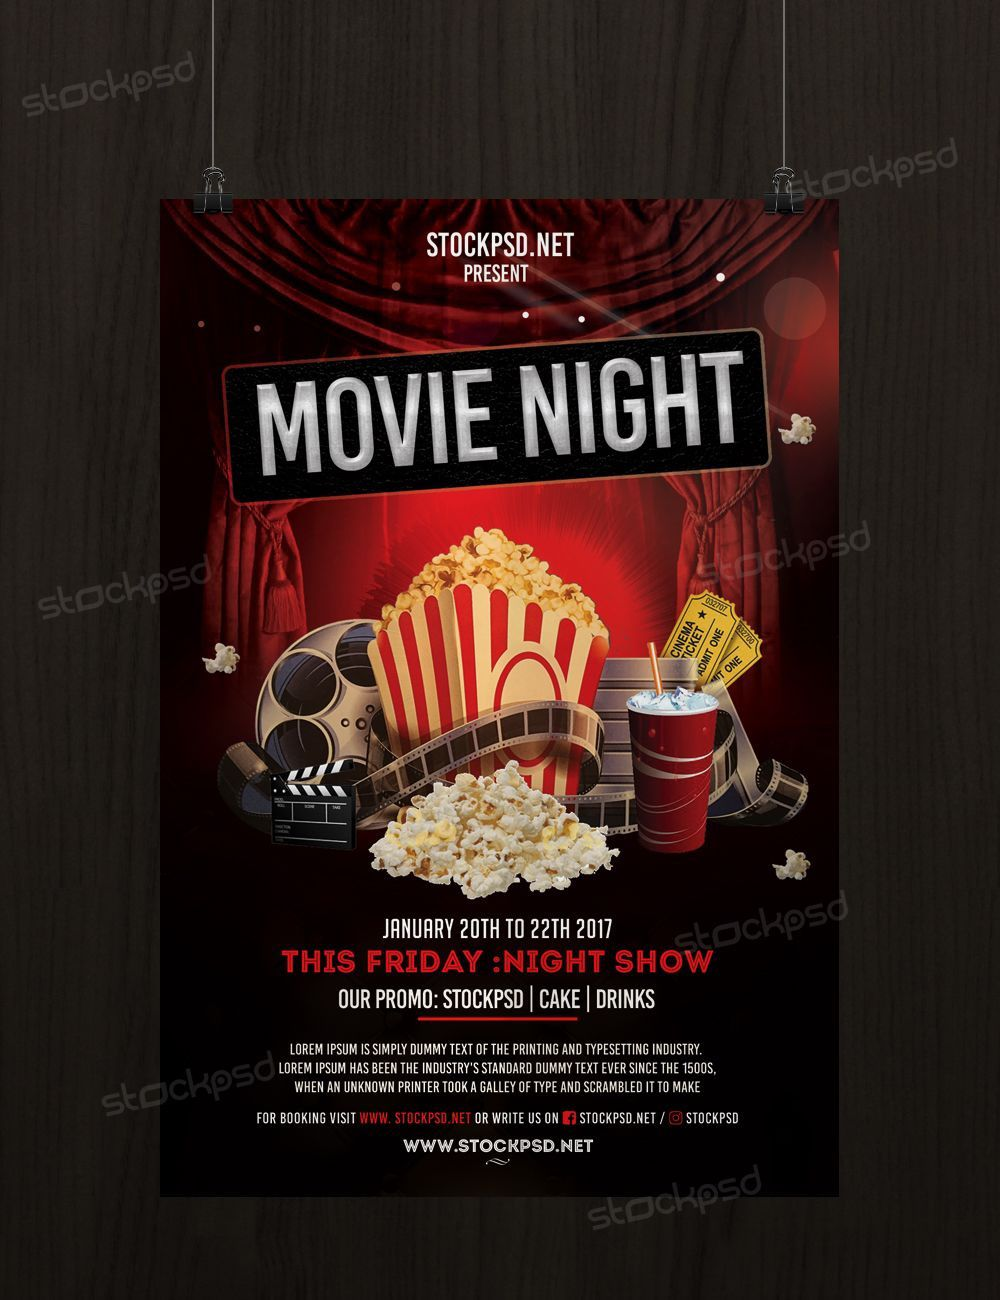 006 Rare Movie Night Flyer Template Inspiration  Editable Psd FreeFull